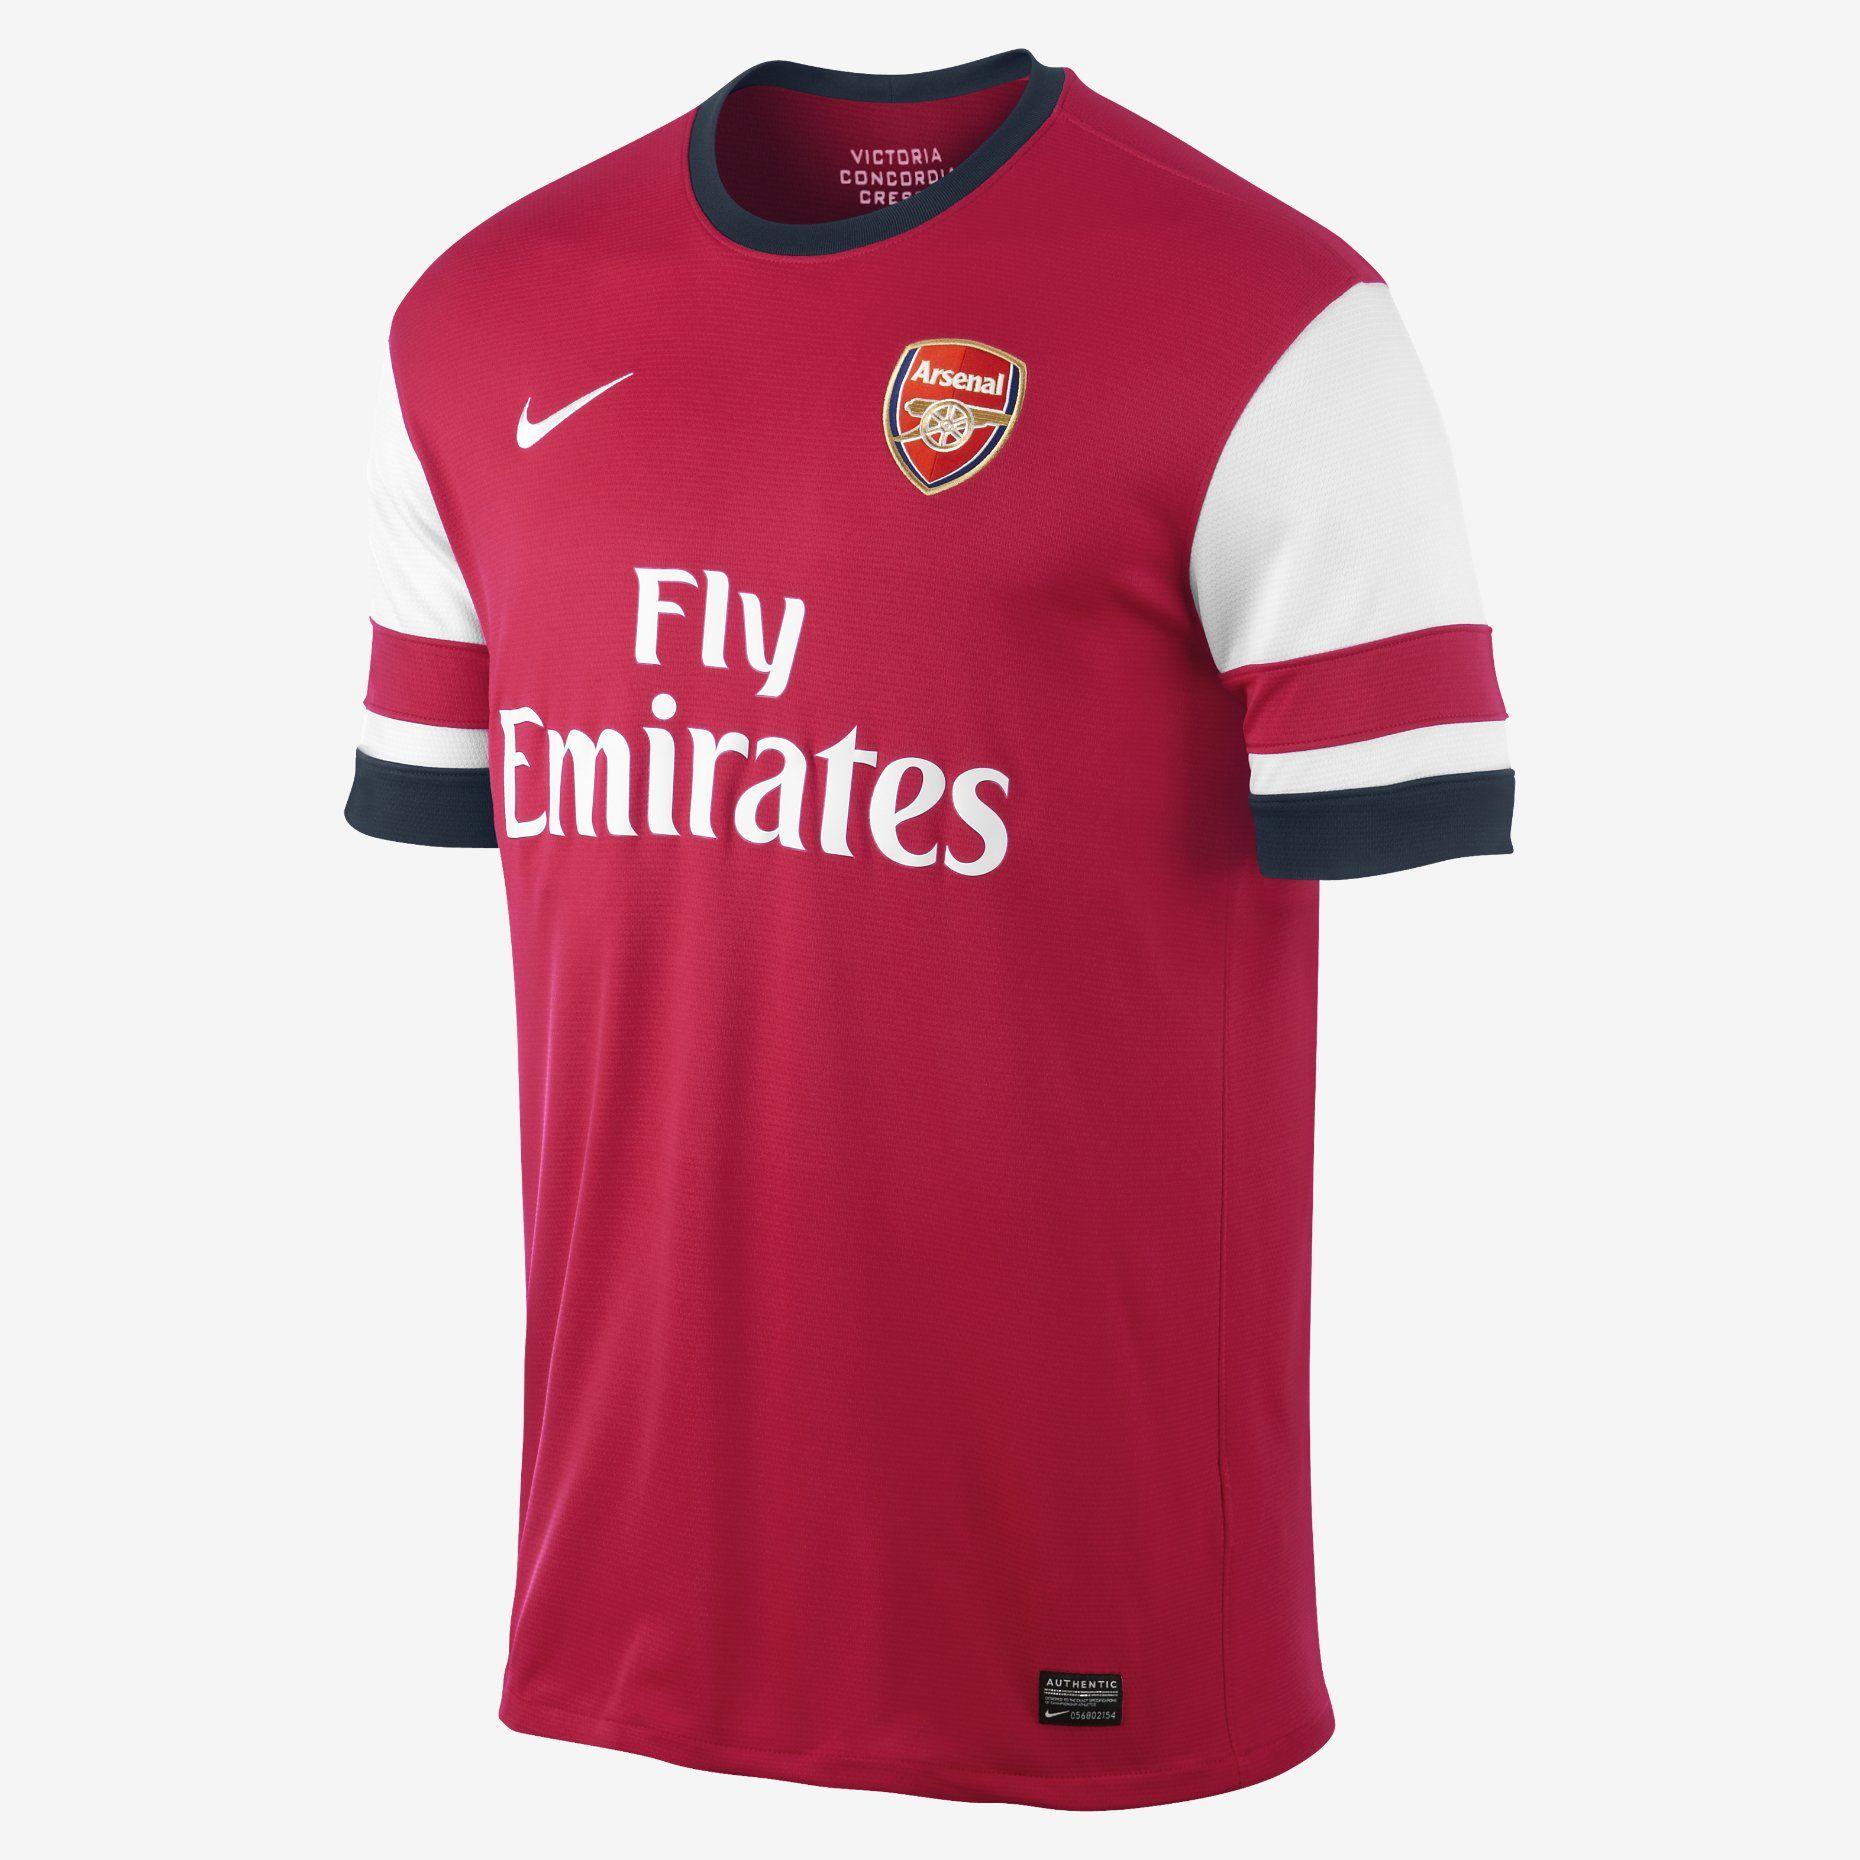 7c73b7f81d Nike Store. 2013 14 Arsenal Football Club Replica Short-Sleeve Men s ...